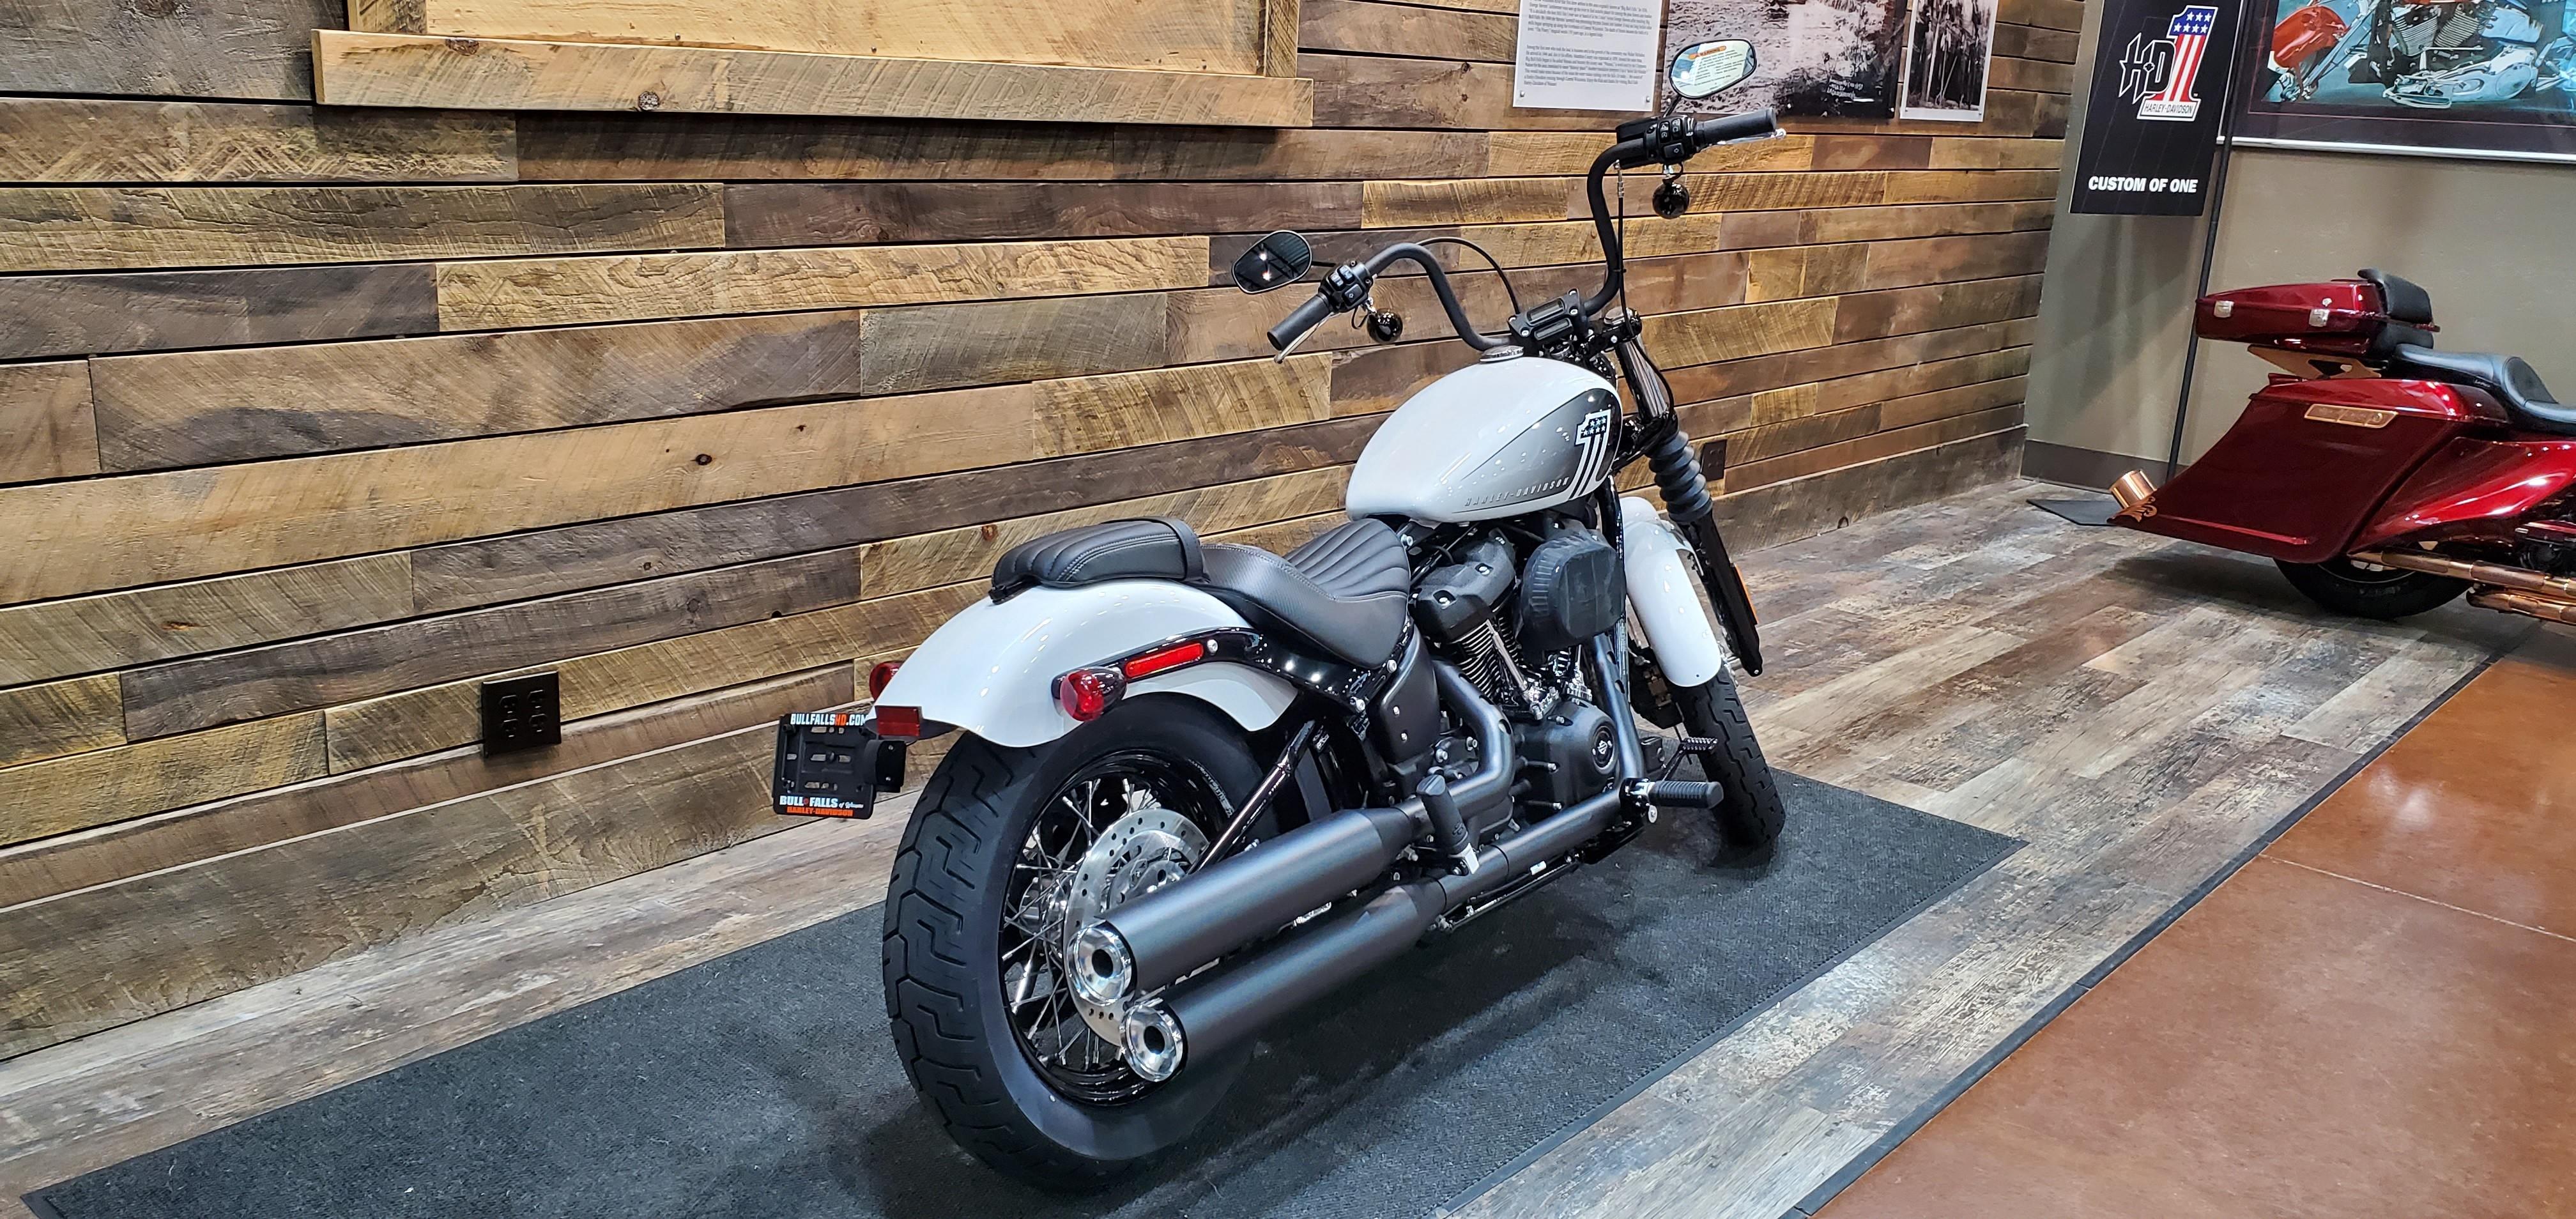 2021 Harley-Davidson Cruiser Street Bob 114 at Bull Falls Harley-Davidson